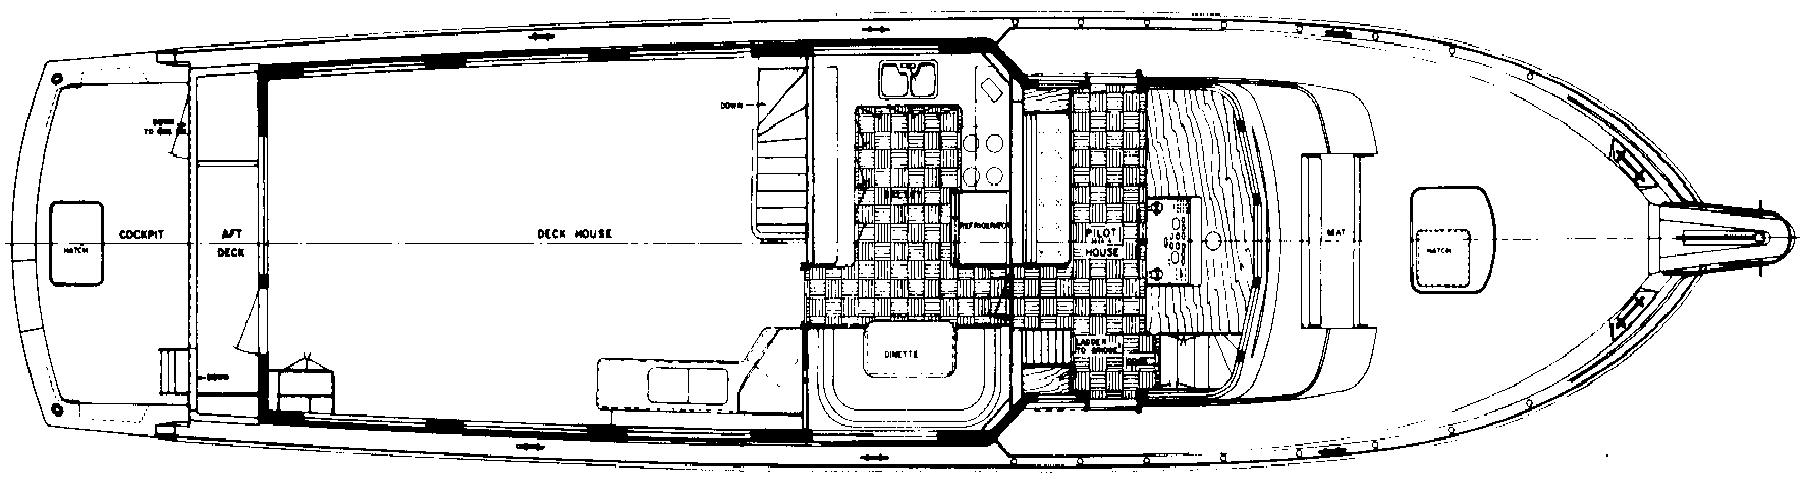 77 Cockpit Motor Yacht Floor Plan 2